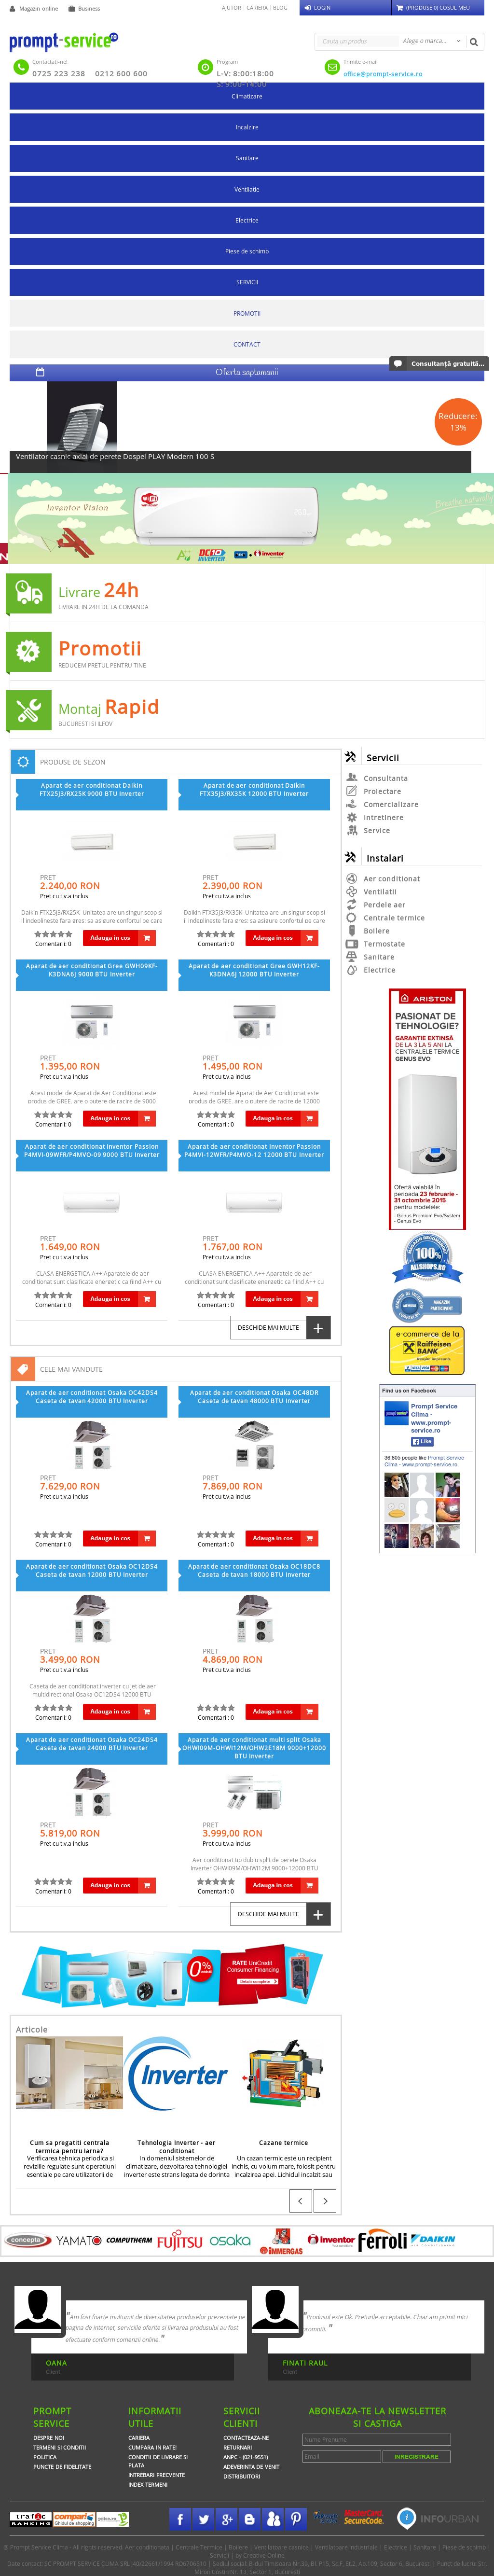 paginas de online dating puno riba online forum za upoznavanje i samci chat